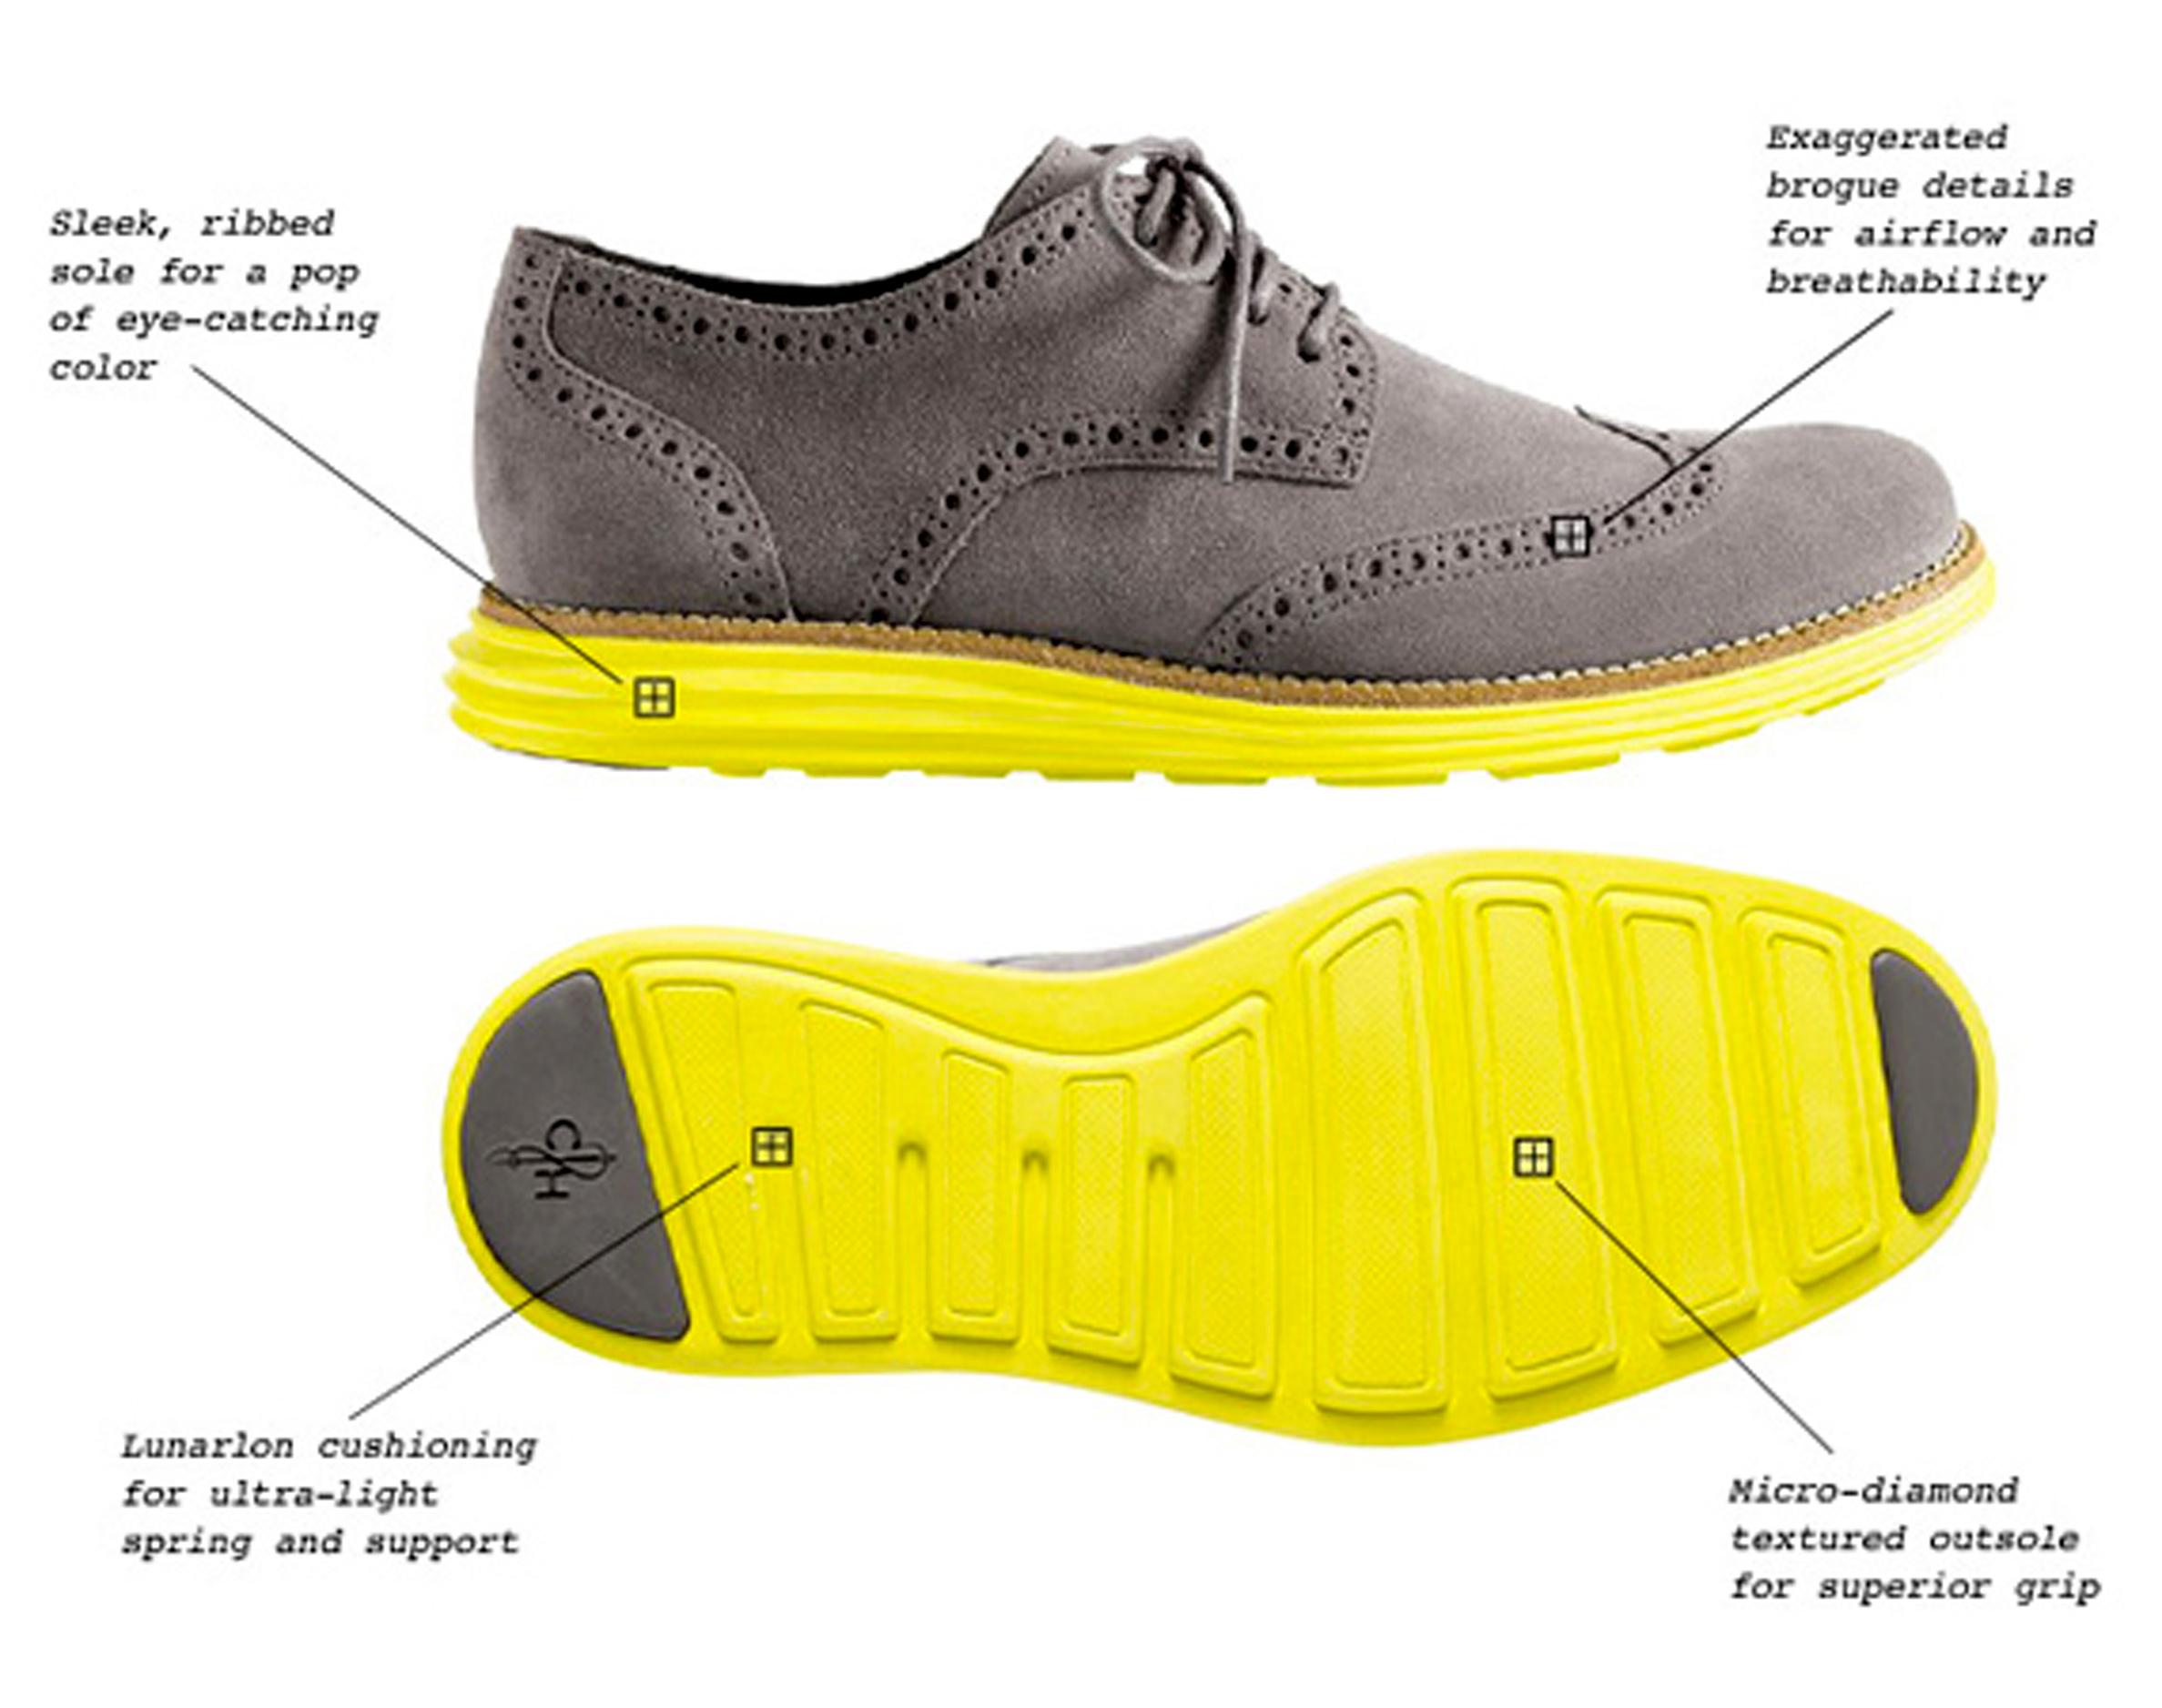 5338752d477430 Theyve been making high quality footwear Enter Lunarlon cushioning ... Cole  Haan LunarGrand Wingtip ...